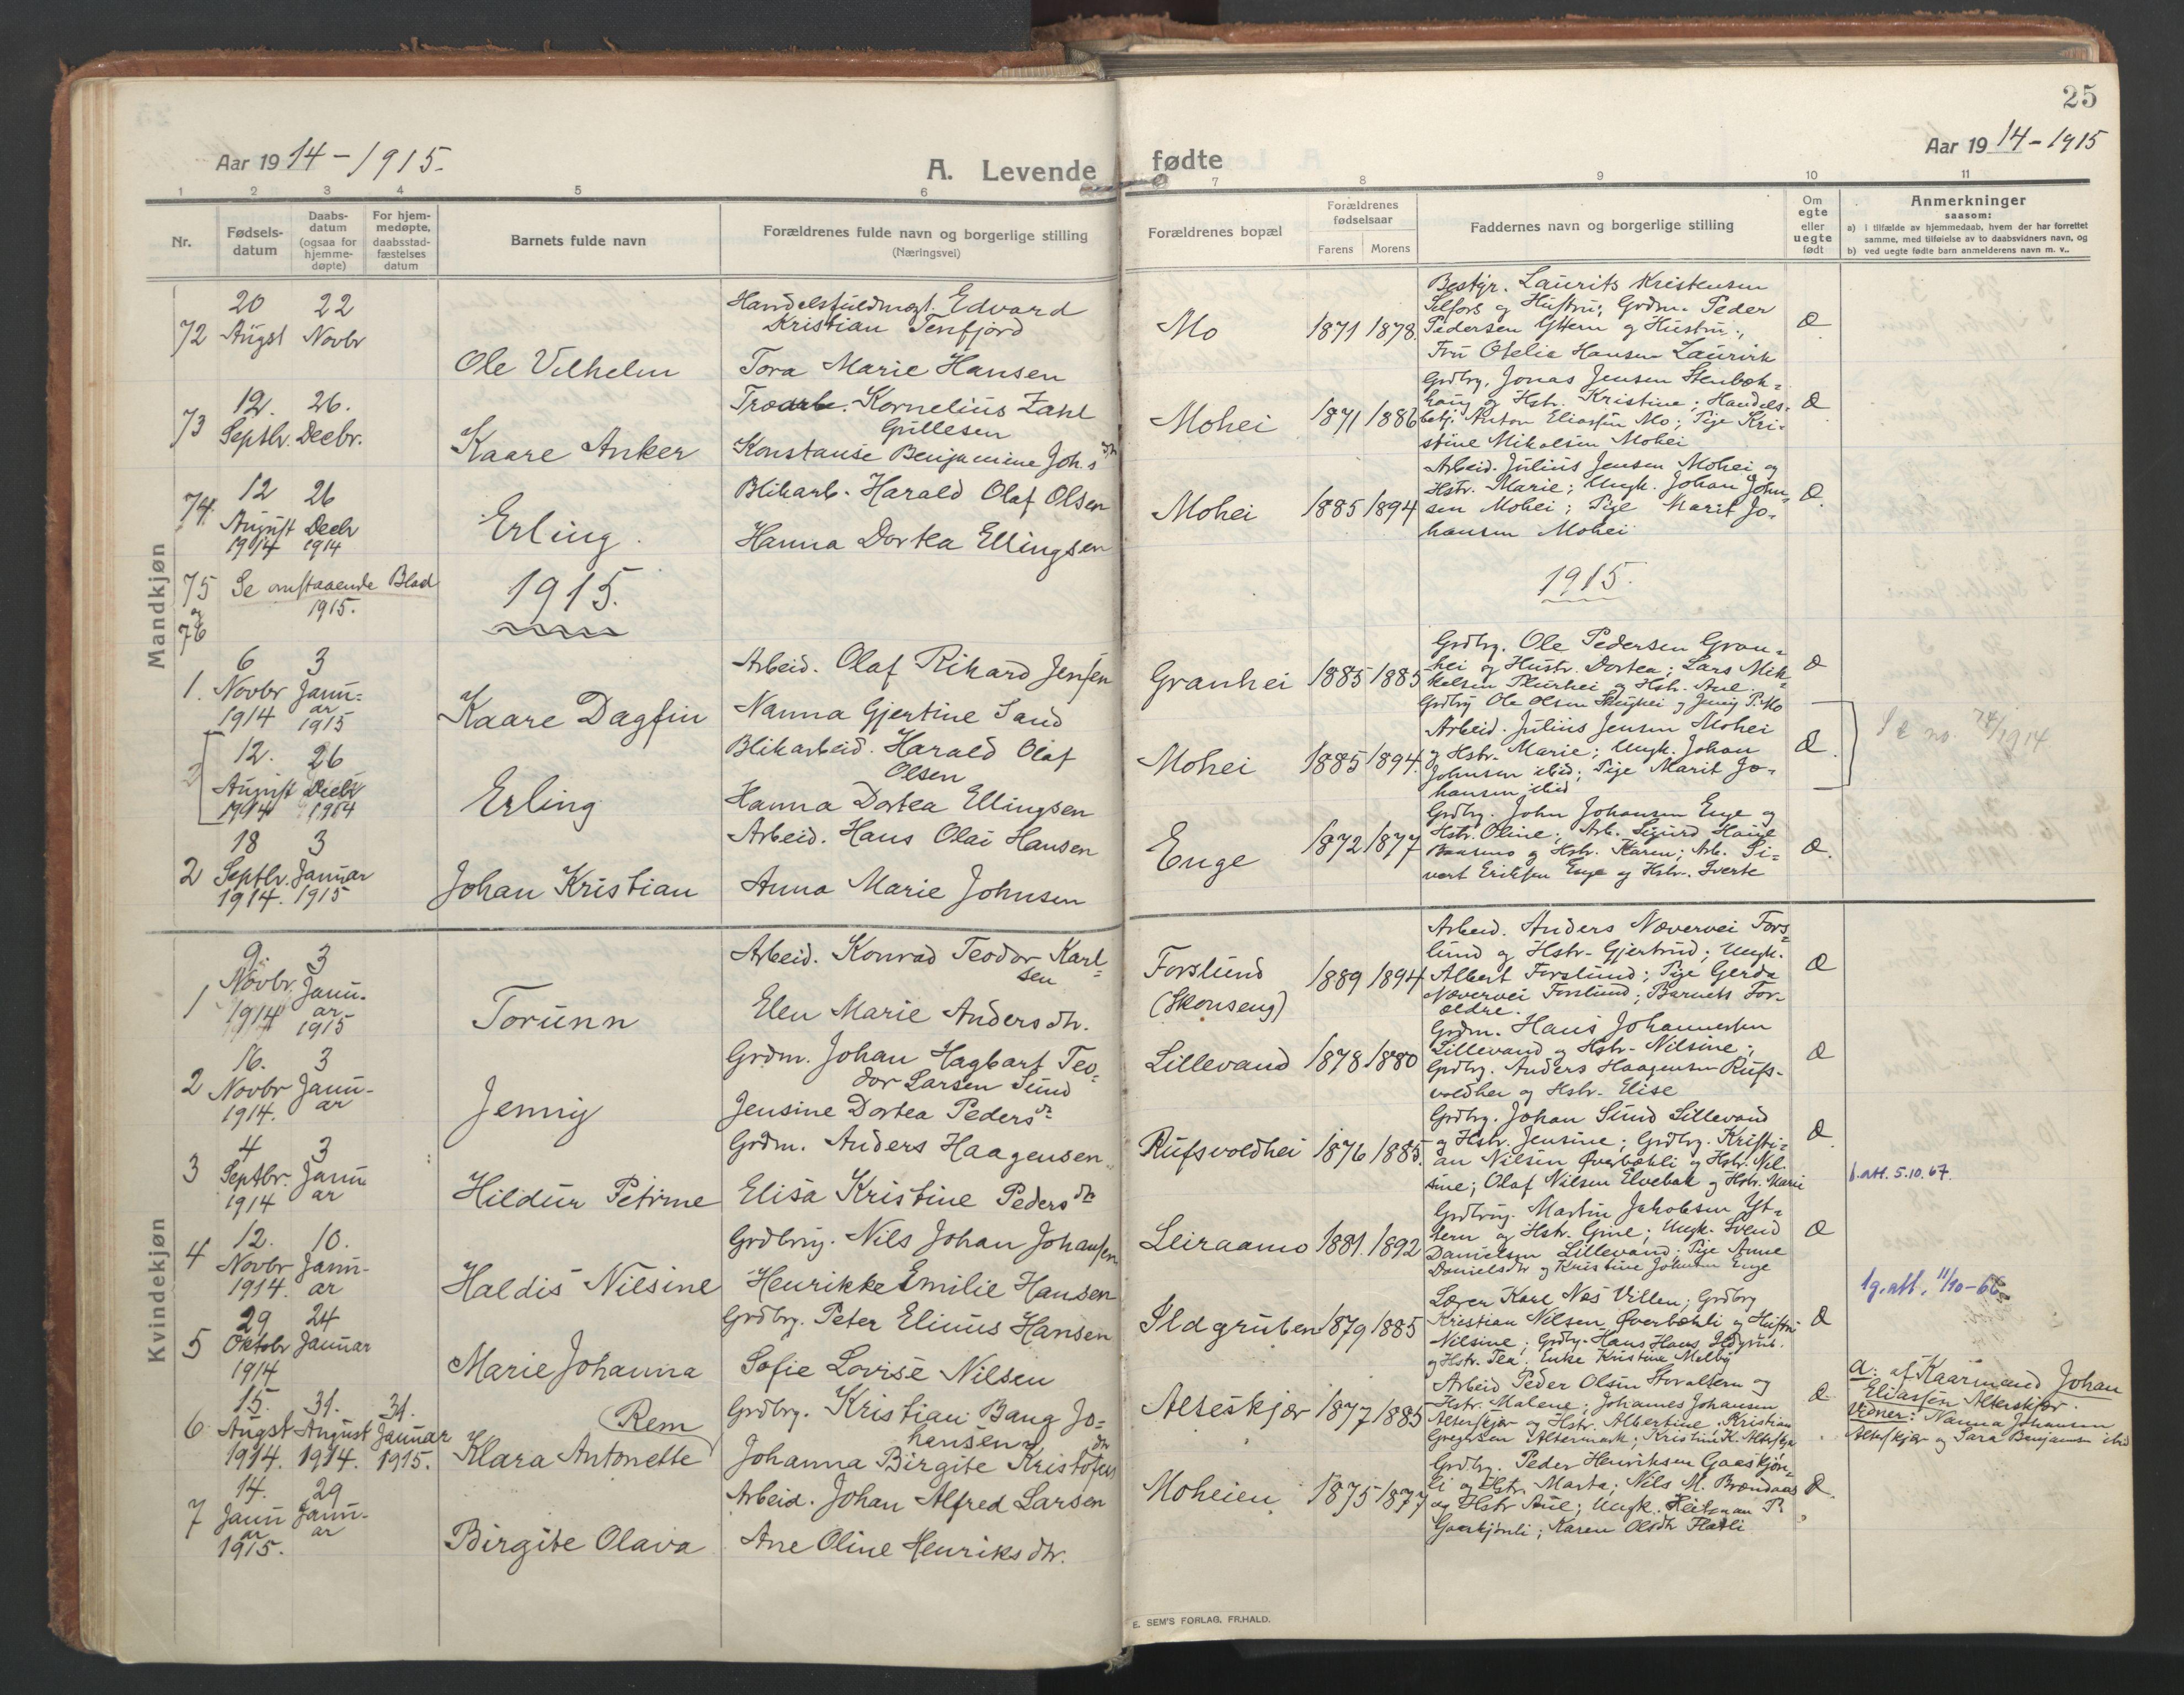 SAT, Ministerialprotokoller, klokkerbøker og fødselsregistre - Nordland, 827/L0404: Ministerialbok nr. 827A16, 1912-1925, s. 25